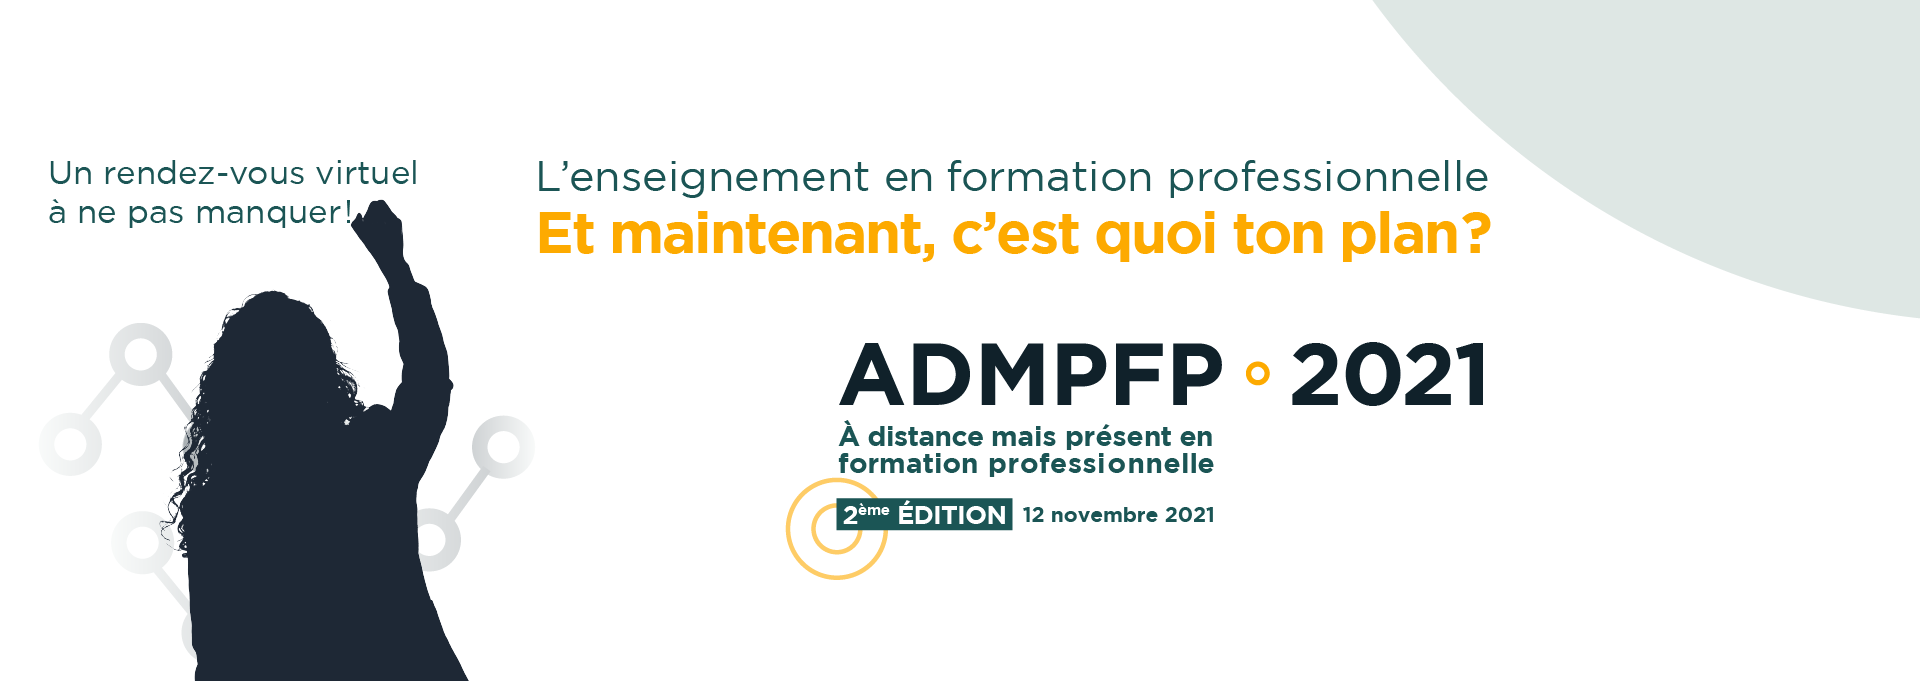 header admpfp 2021